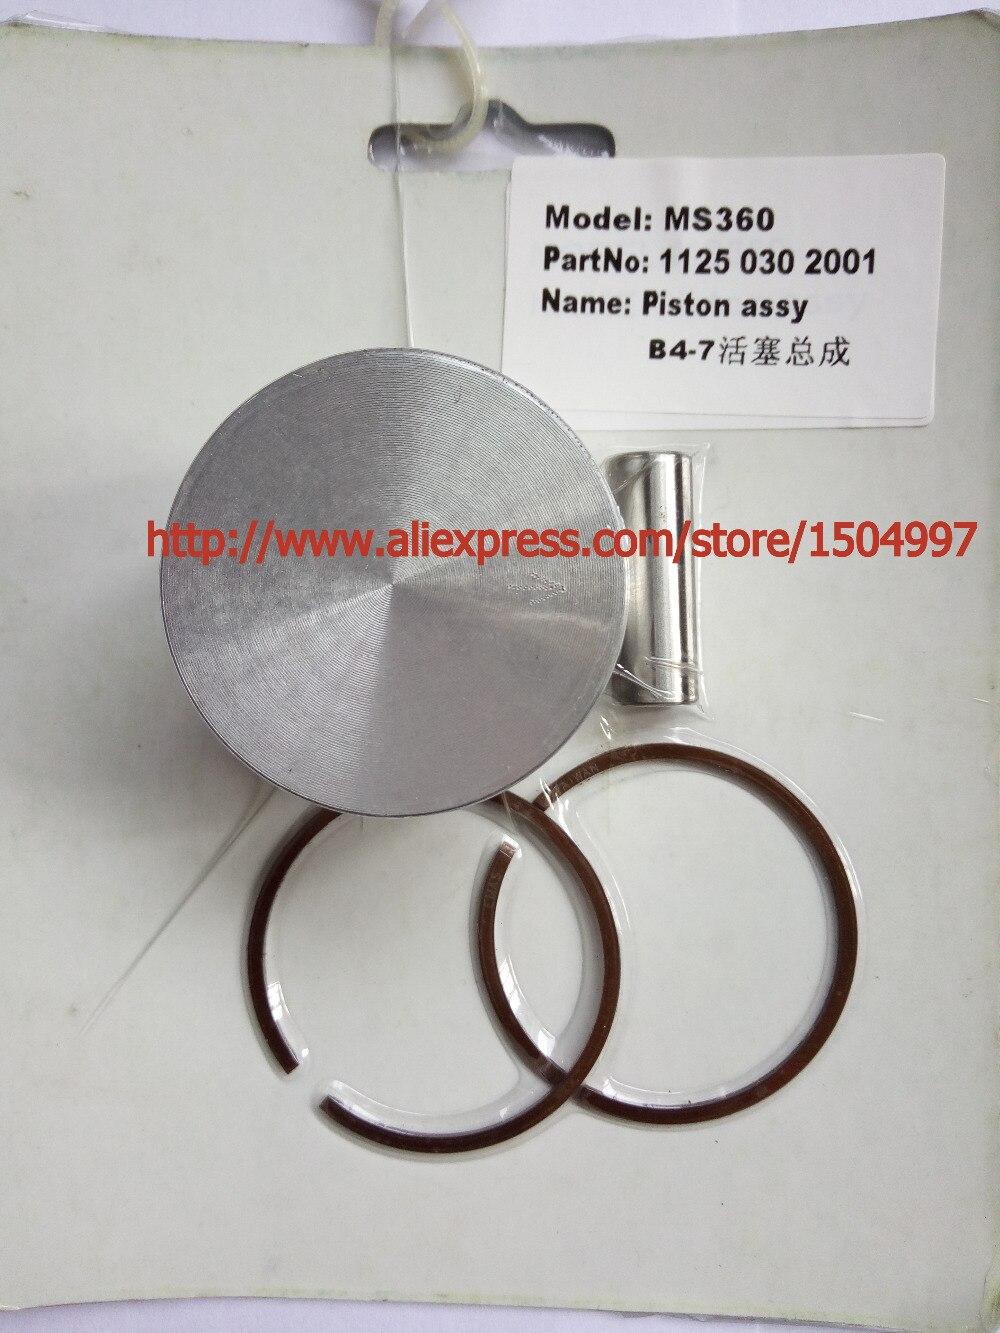 Piston Kit With Pin Rings Clips Assy Set Kit For  Kolben Fur 036 MS360 MS 360 48mm Piston